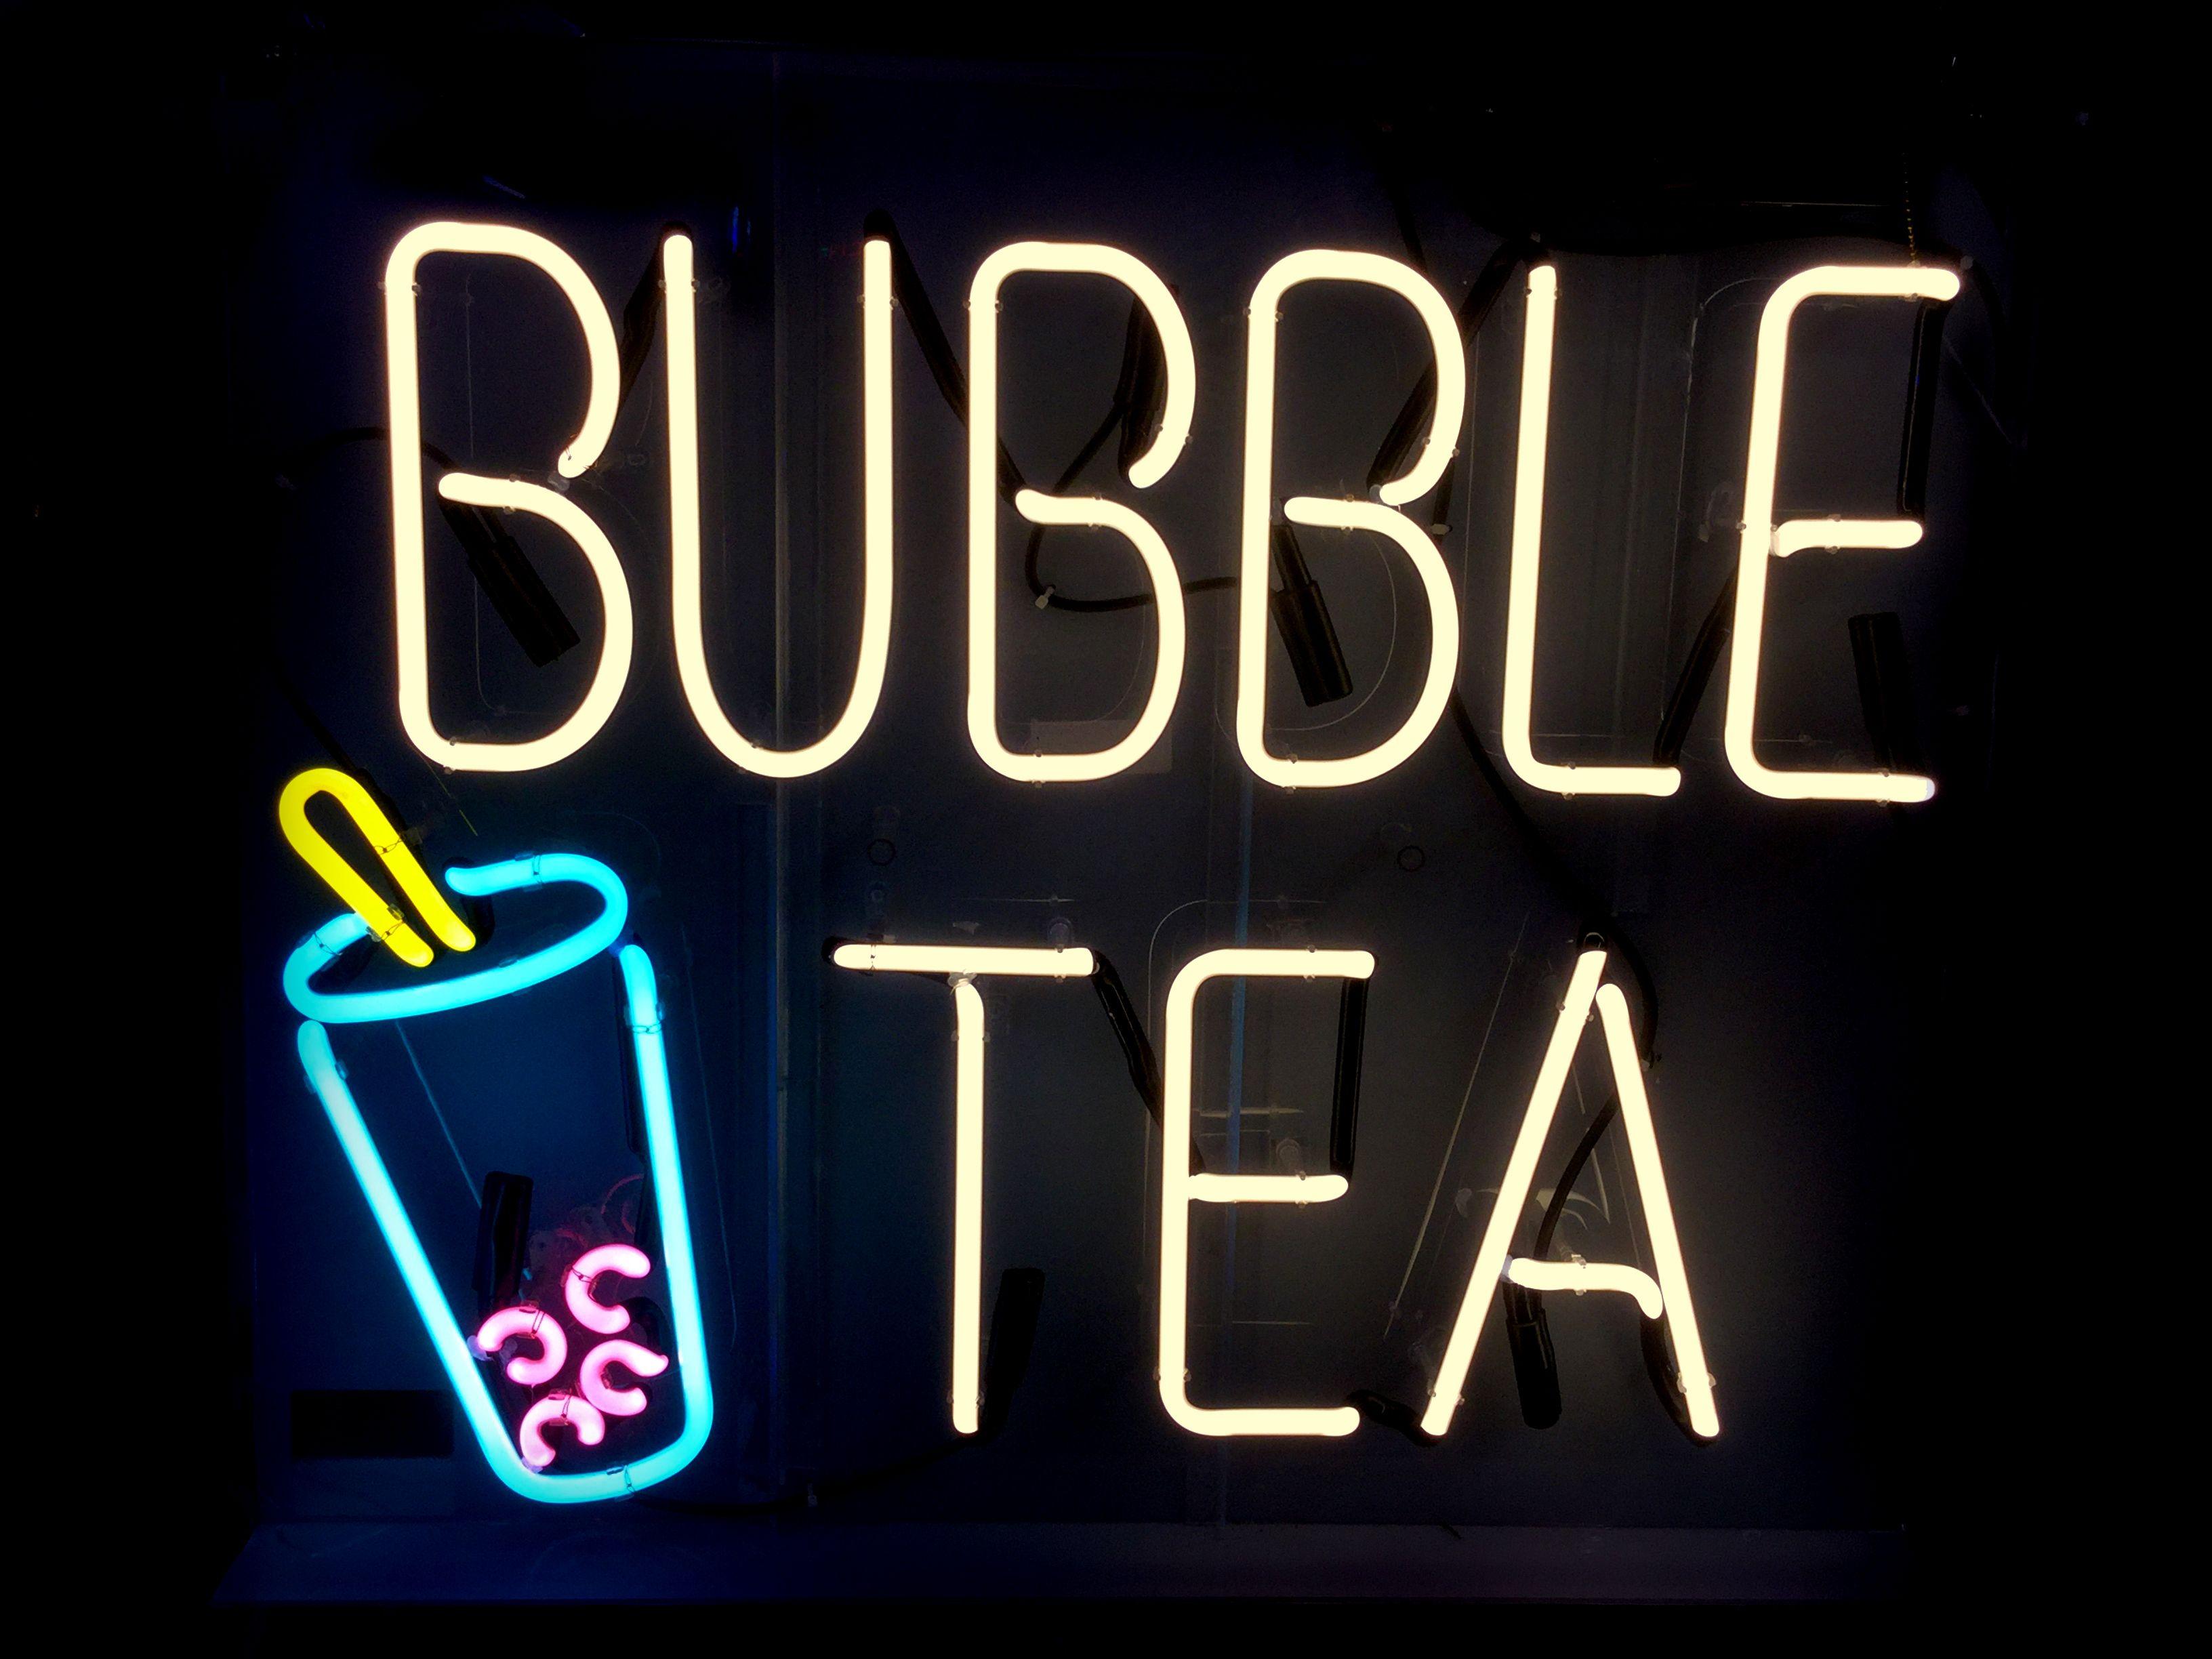 A Custom Neon Sign Made By Www Jantecneon Com Bubbletea Bobatea